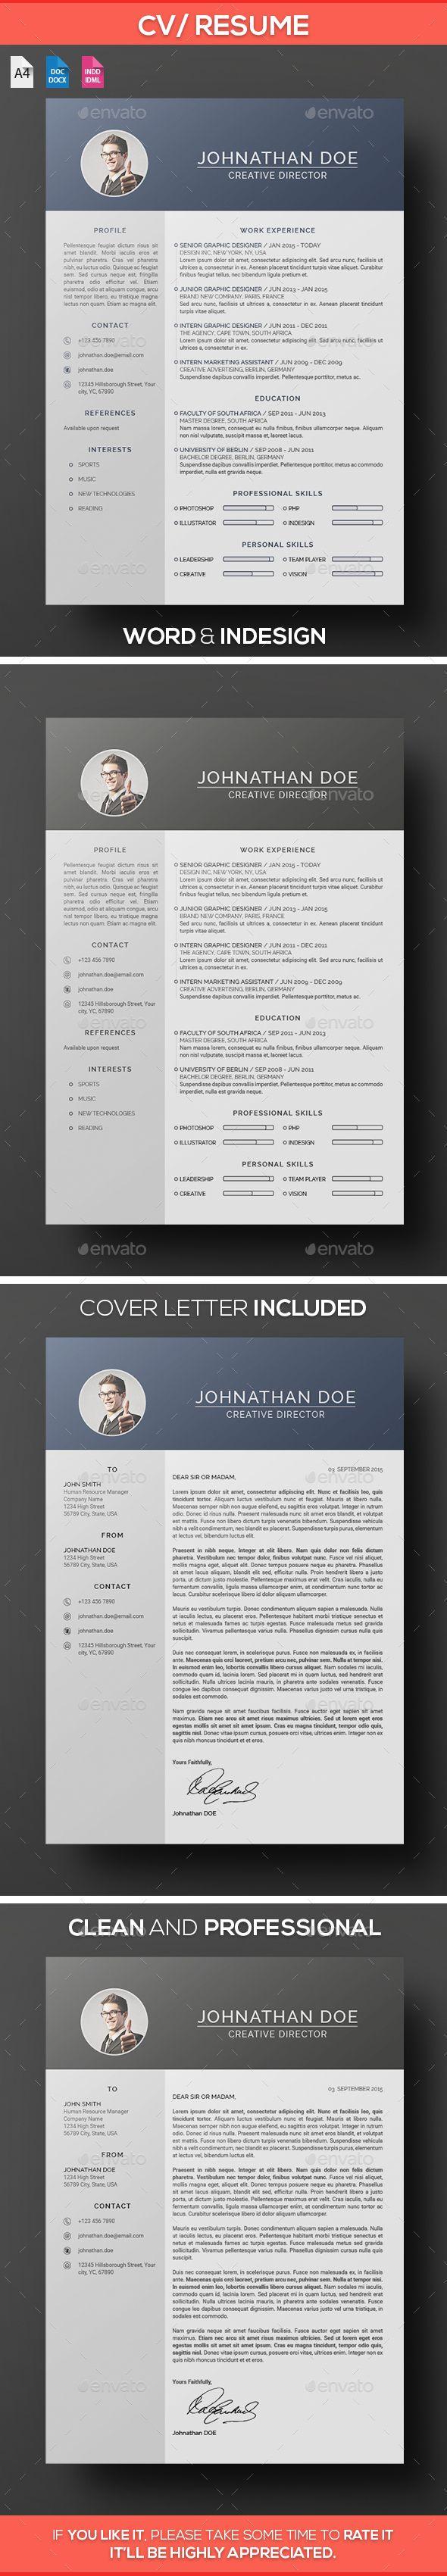 Clean Resume/CV | Pinterest | Currículum y Curriculums